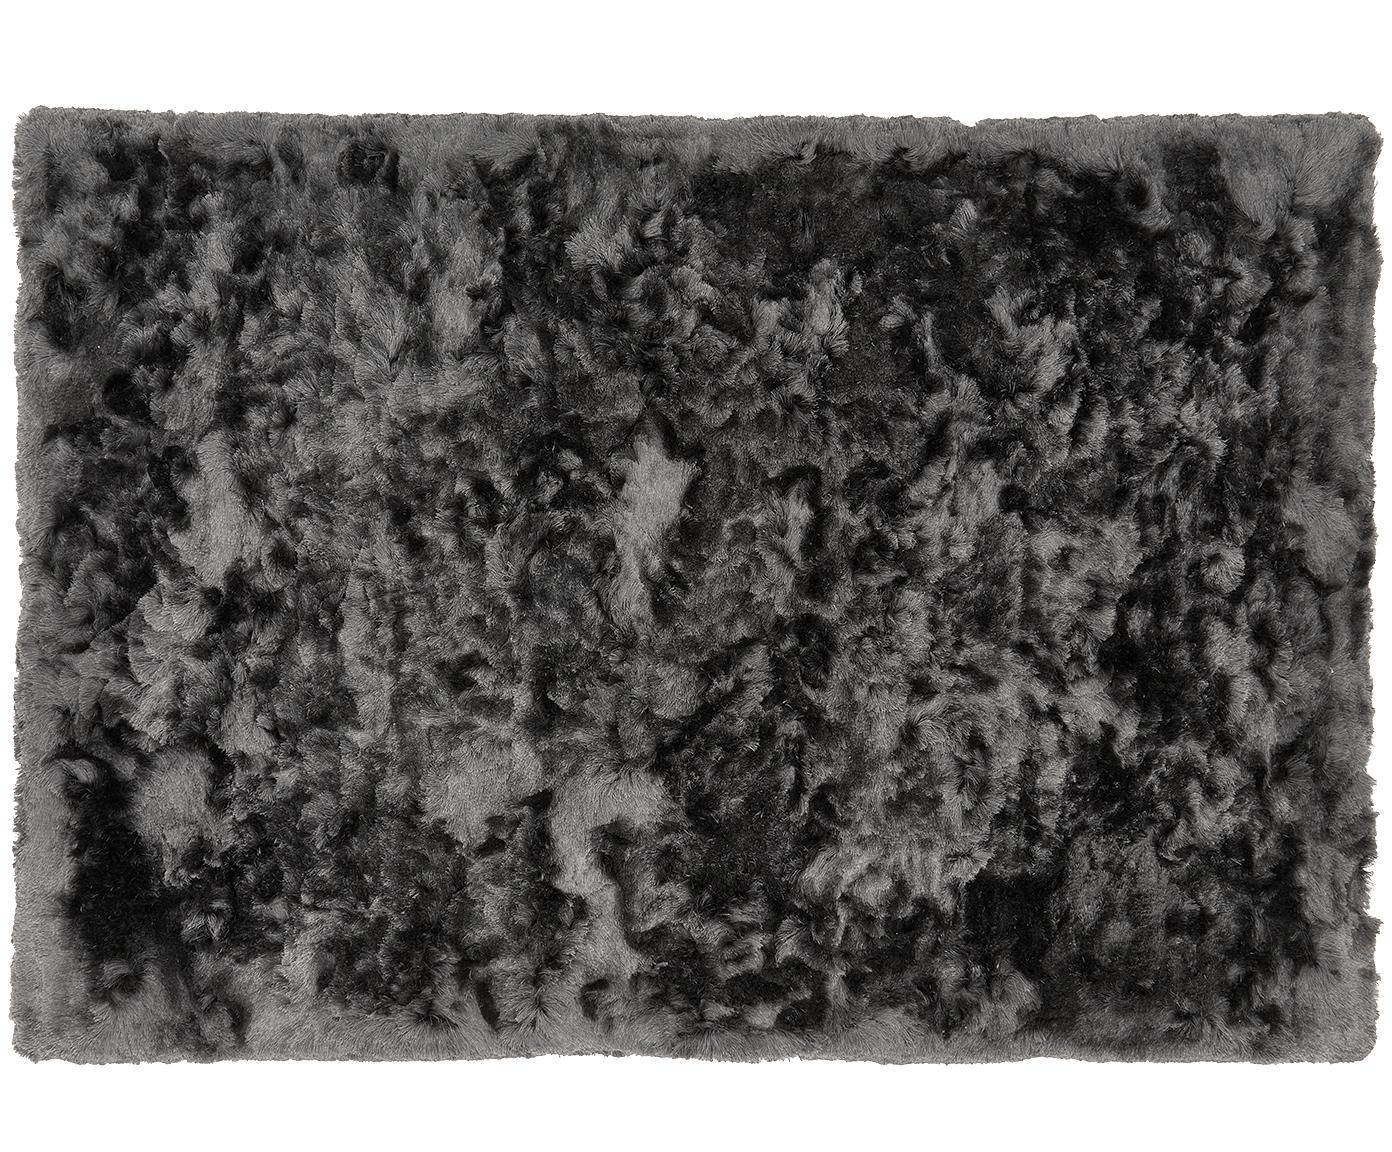 Glänzender Hochflor-Teppich Jimmy in Dunkelgrau, Flor: 100% Polyester, Dunkelgrau, B 120 x L 180 cm (Größe S)